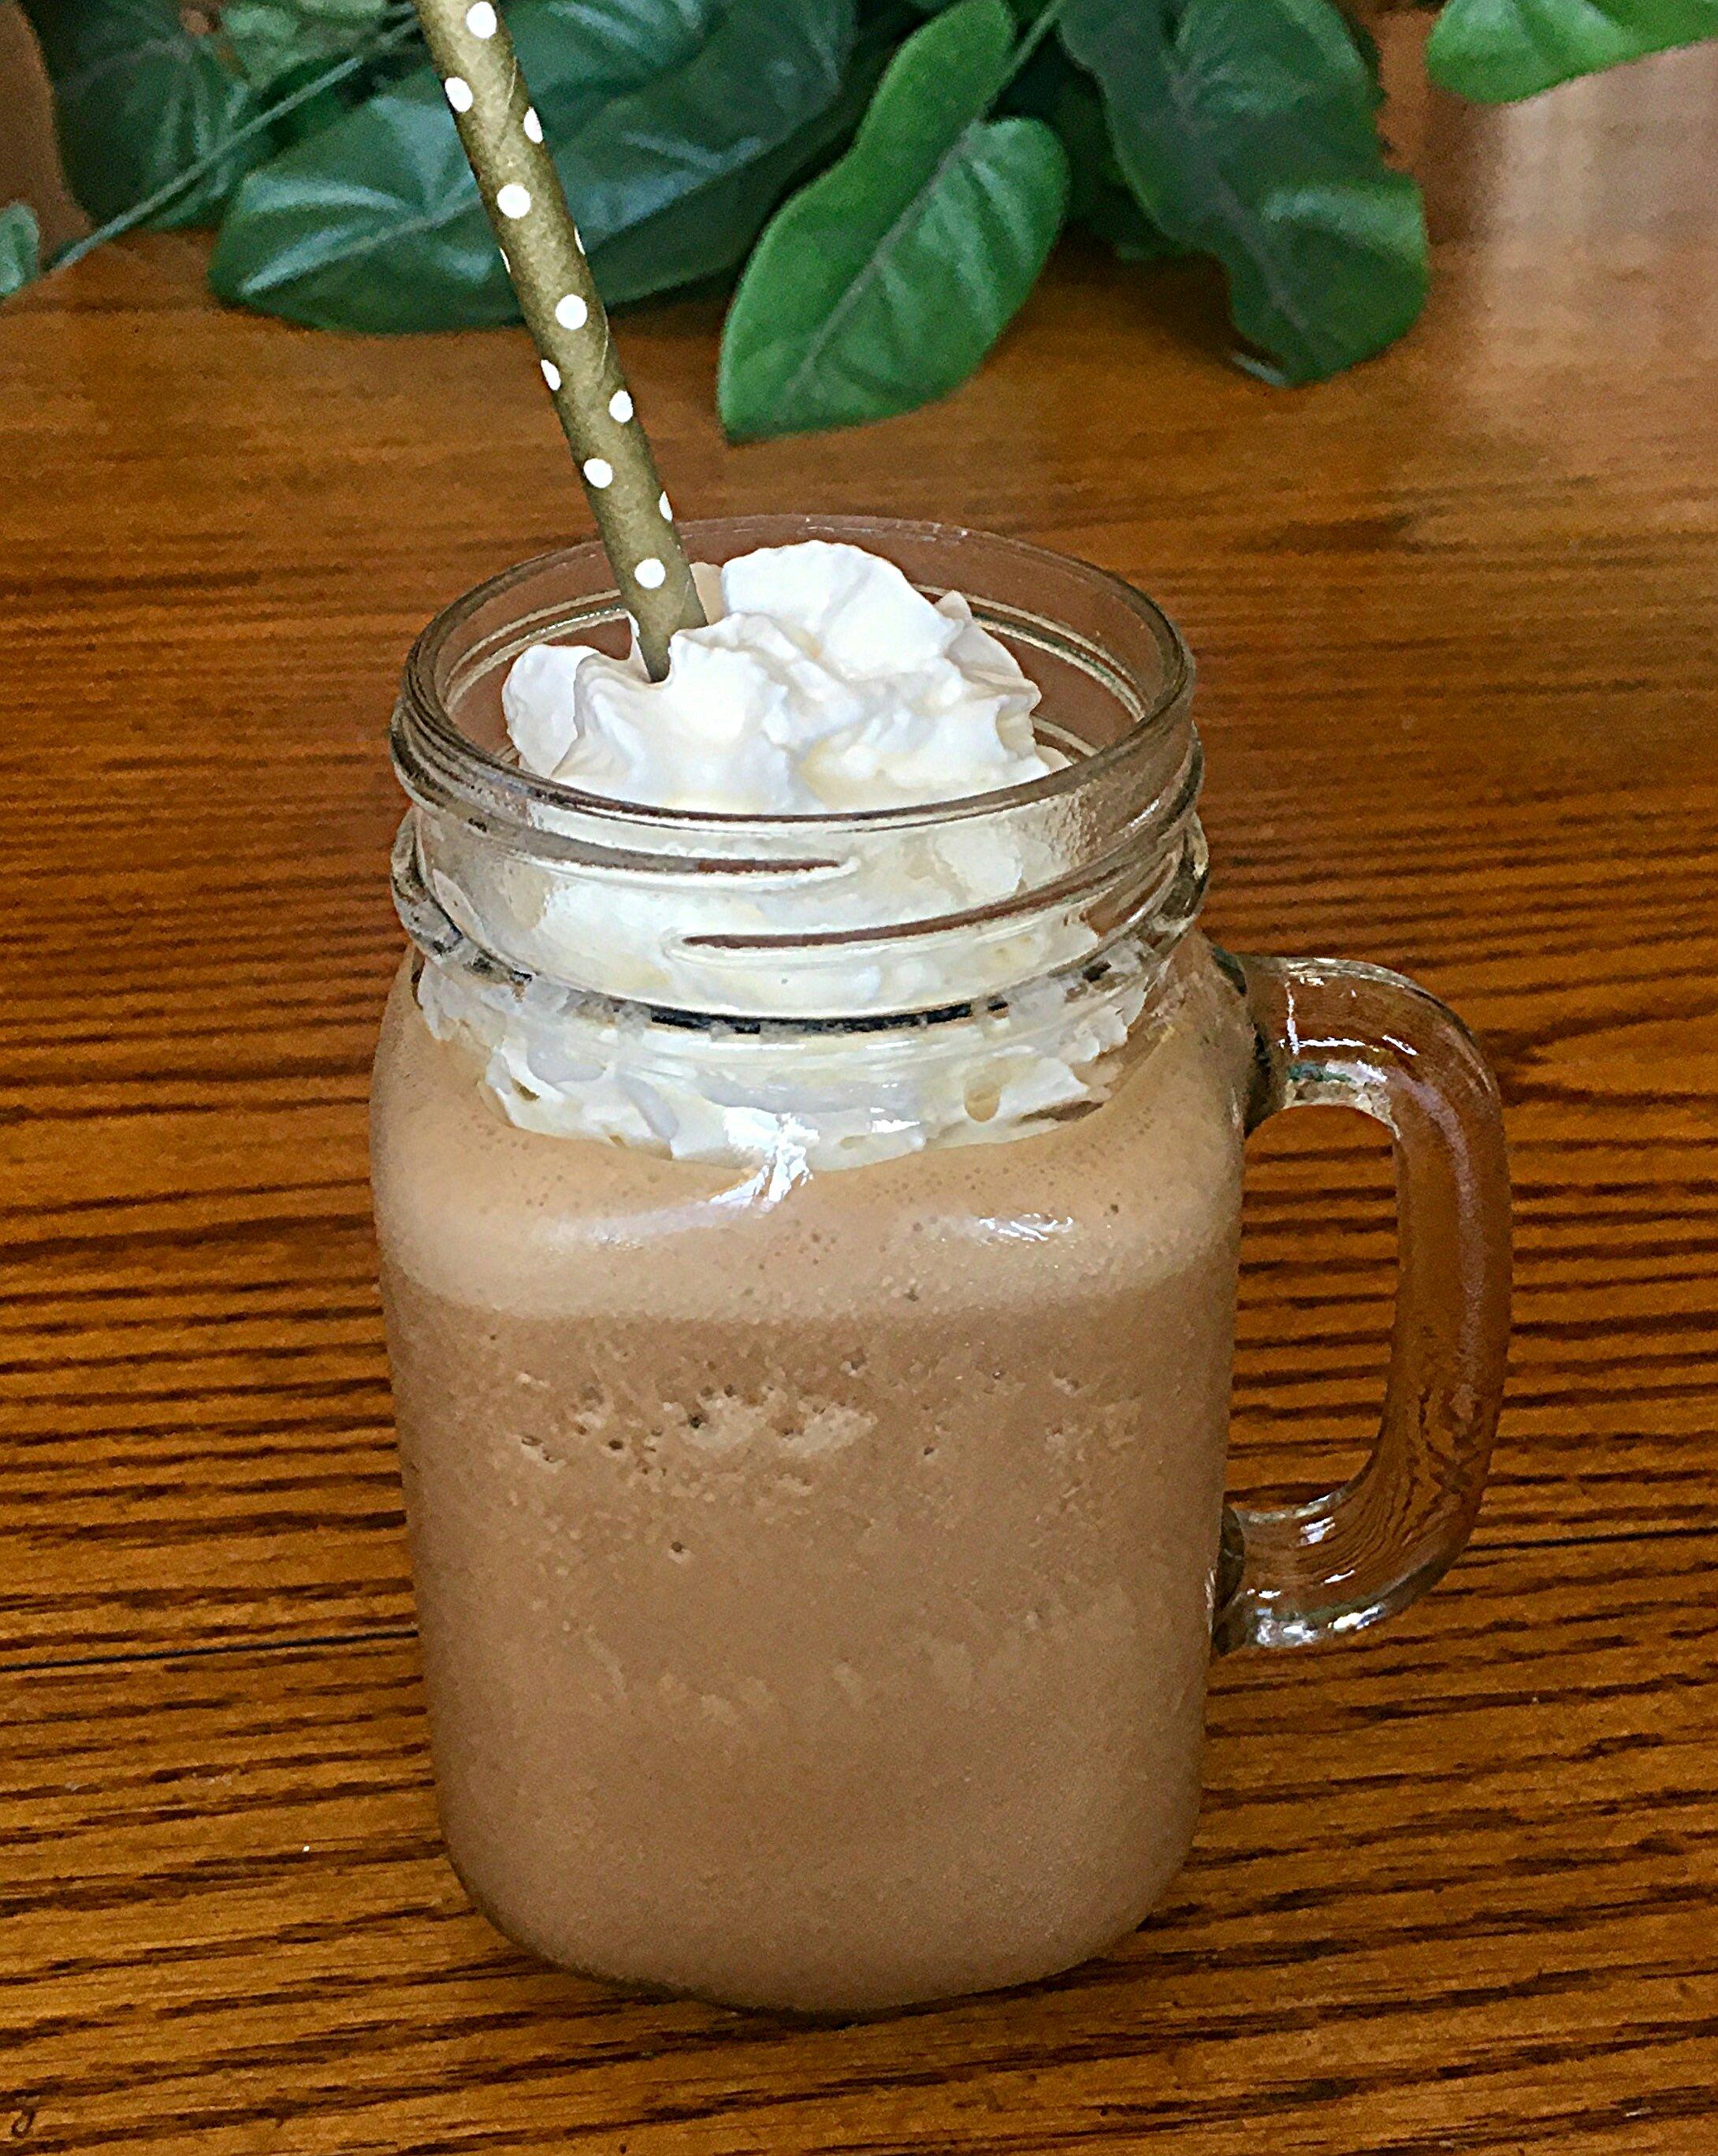 Chocolate Peanut Butter Iced Coffee Yoly